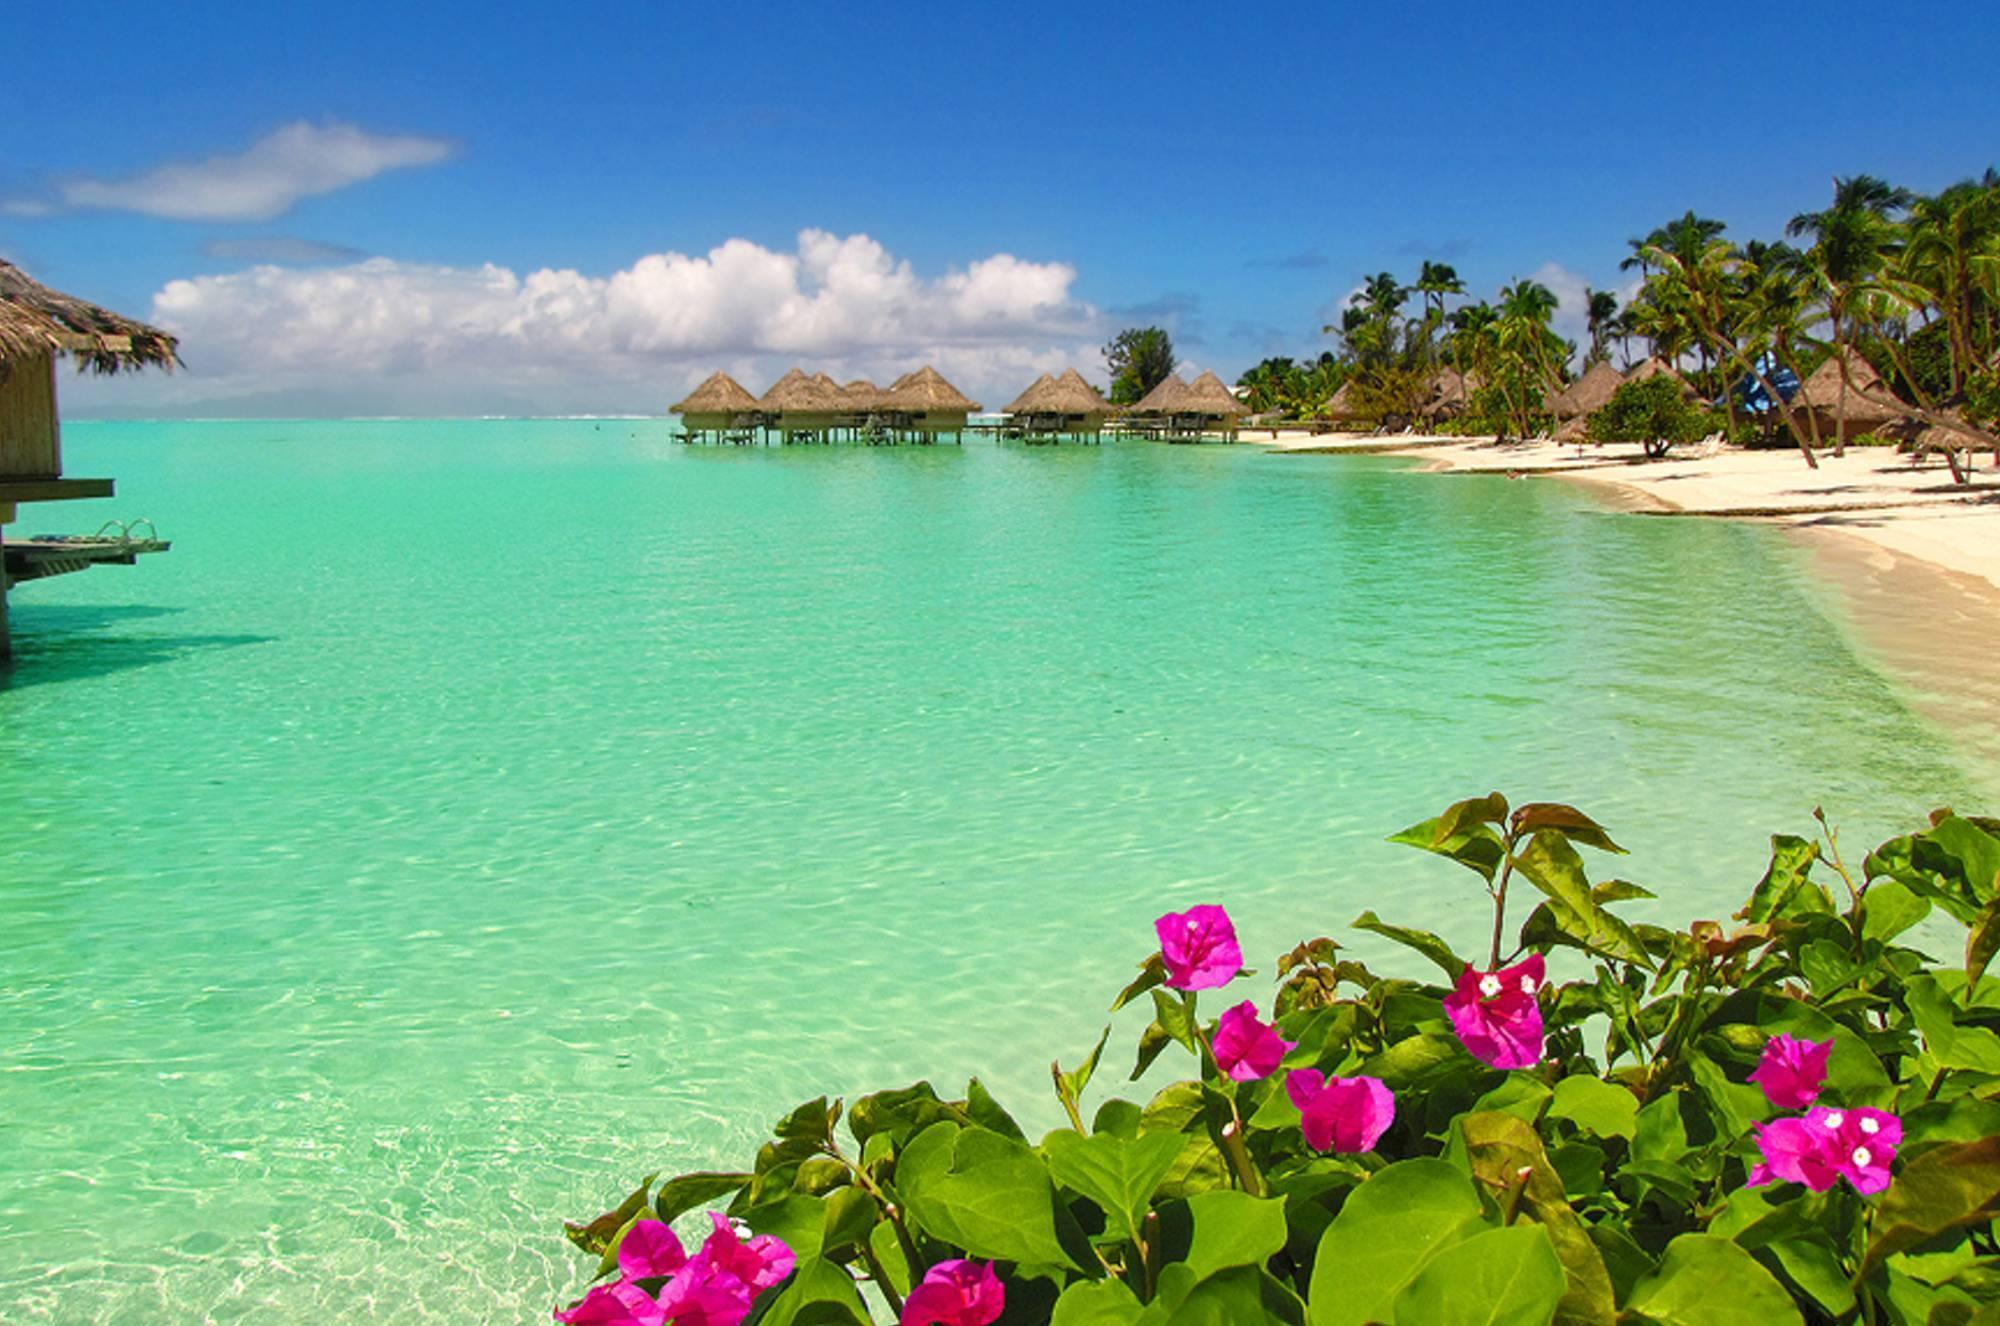 Bora Bora Bungalows 4k Hd Desktop Wallpaper For Wide: Top Free Bora Bora Backgrounds